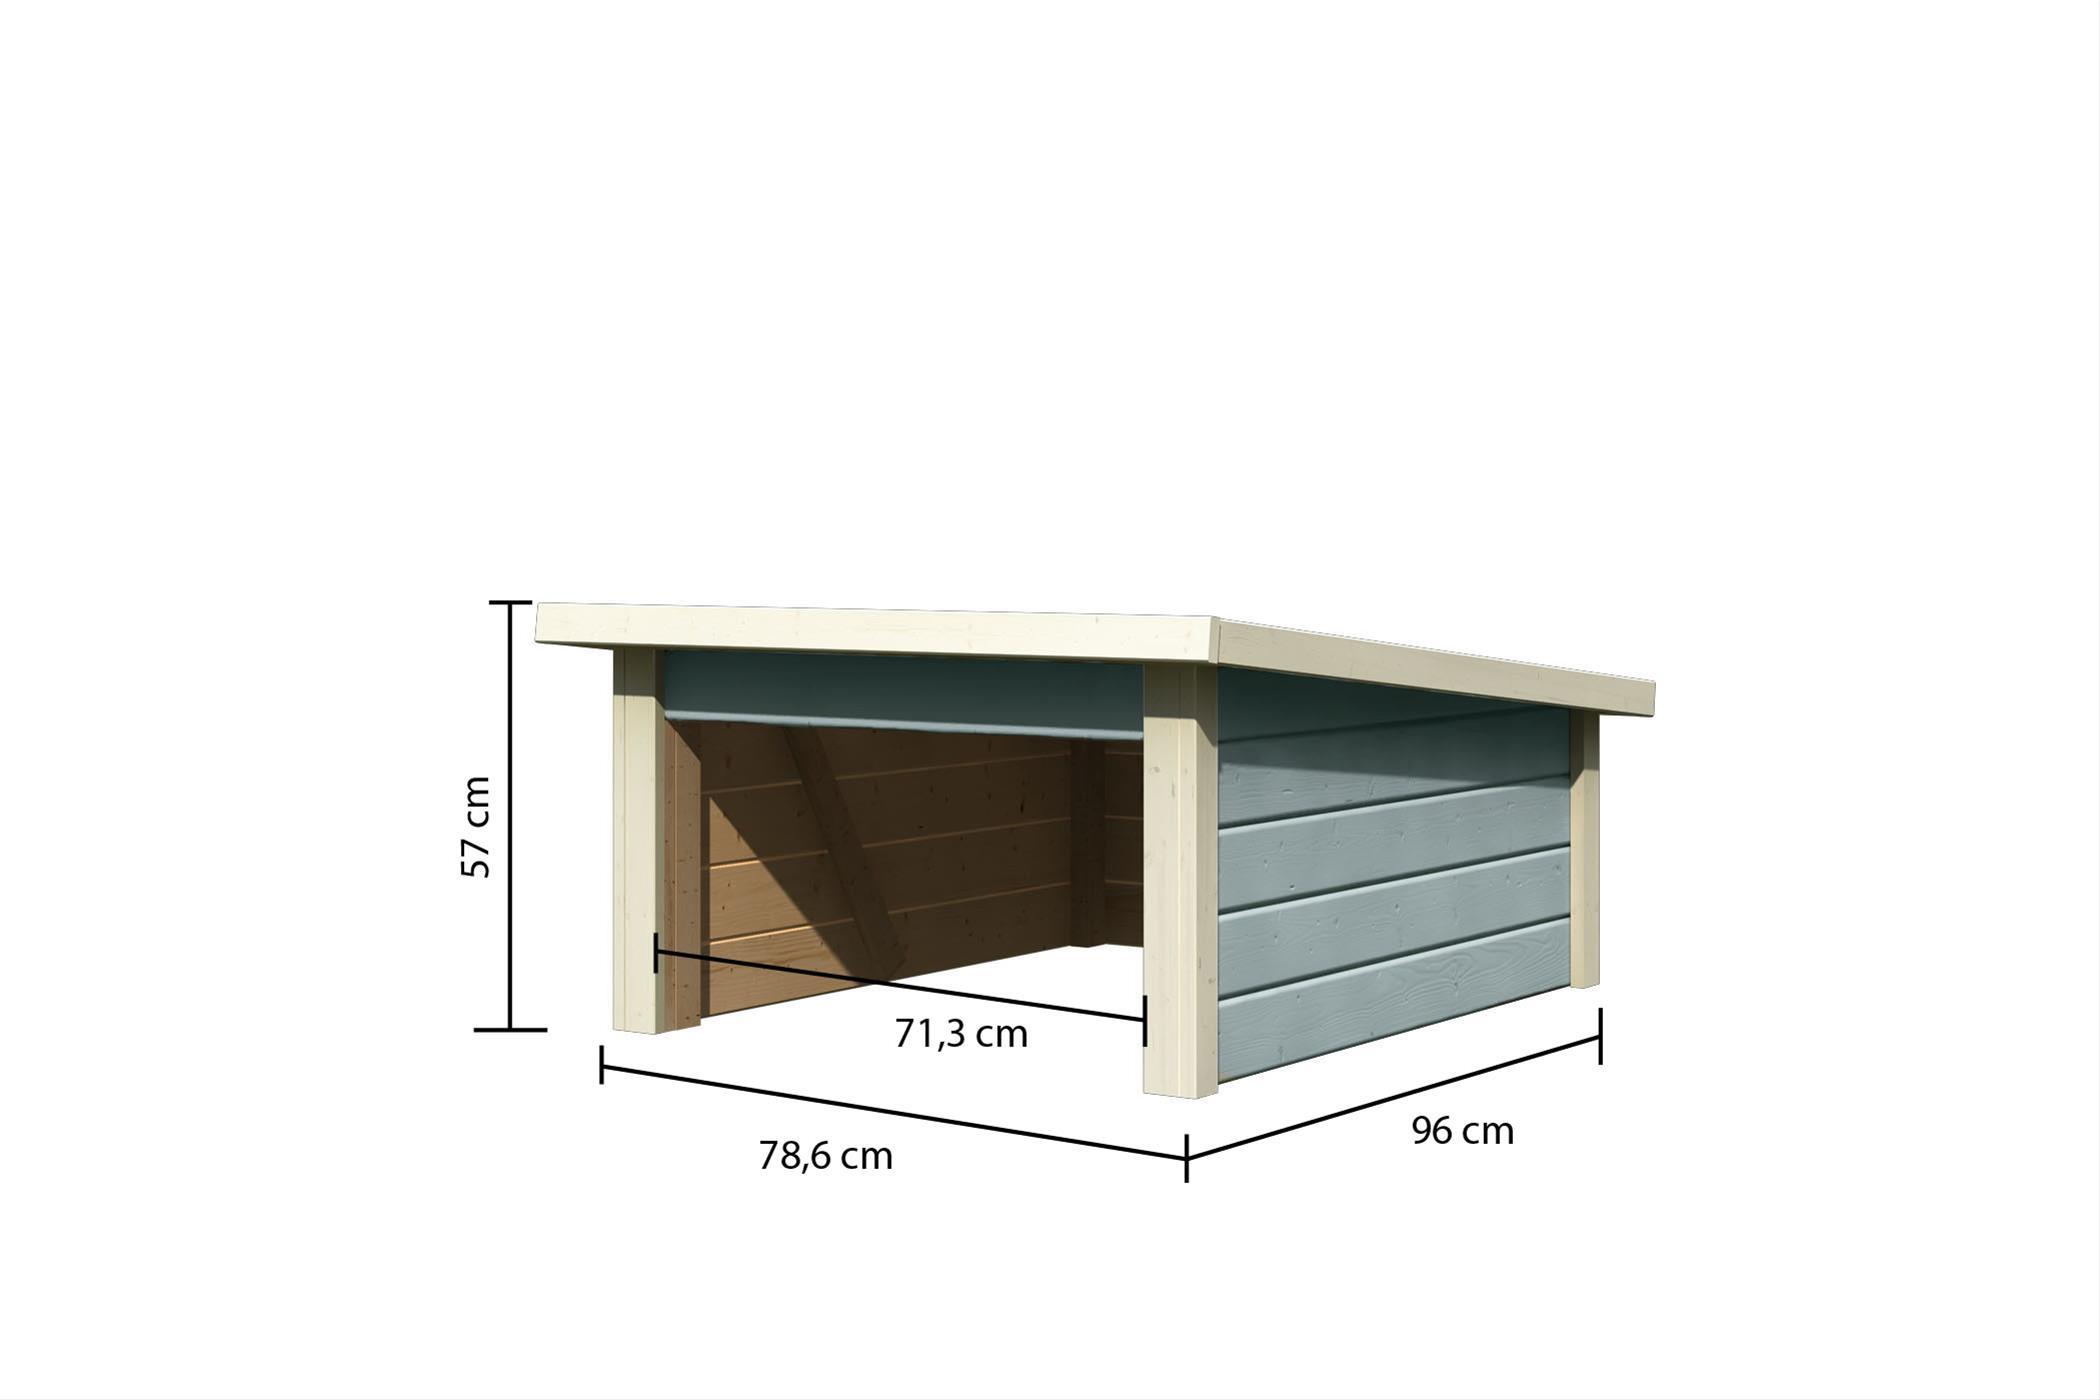 Woodfeeling Mähroboter Haus / Garage 2 seidengrau 79x96x57cm Bild 3